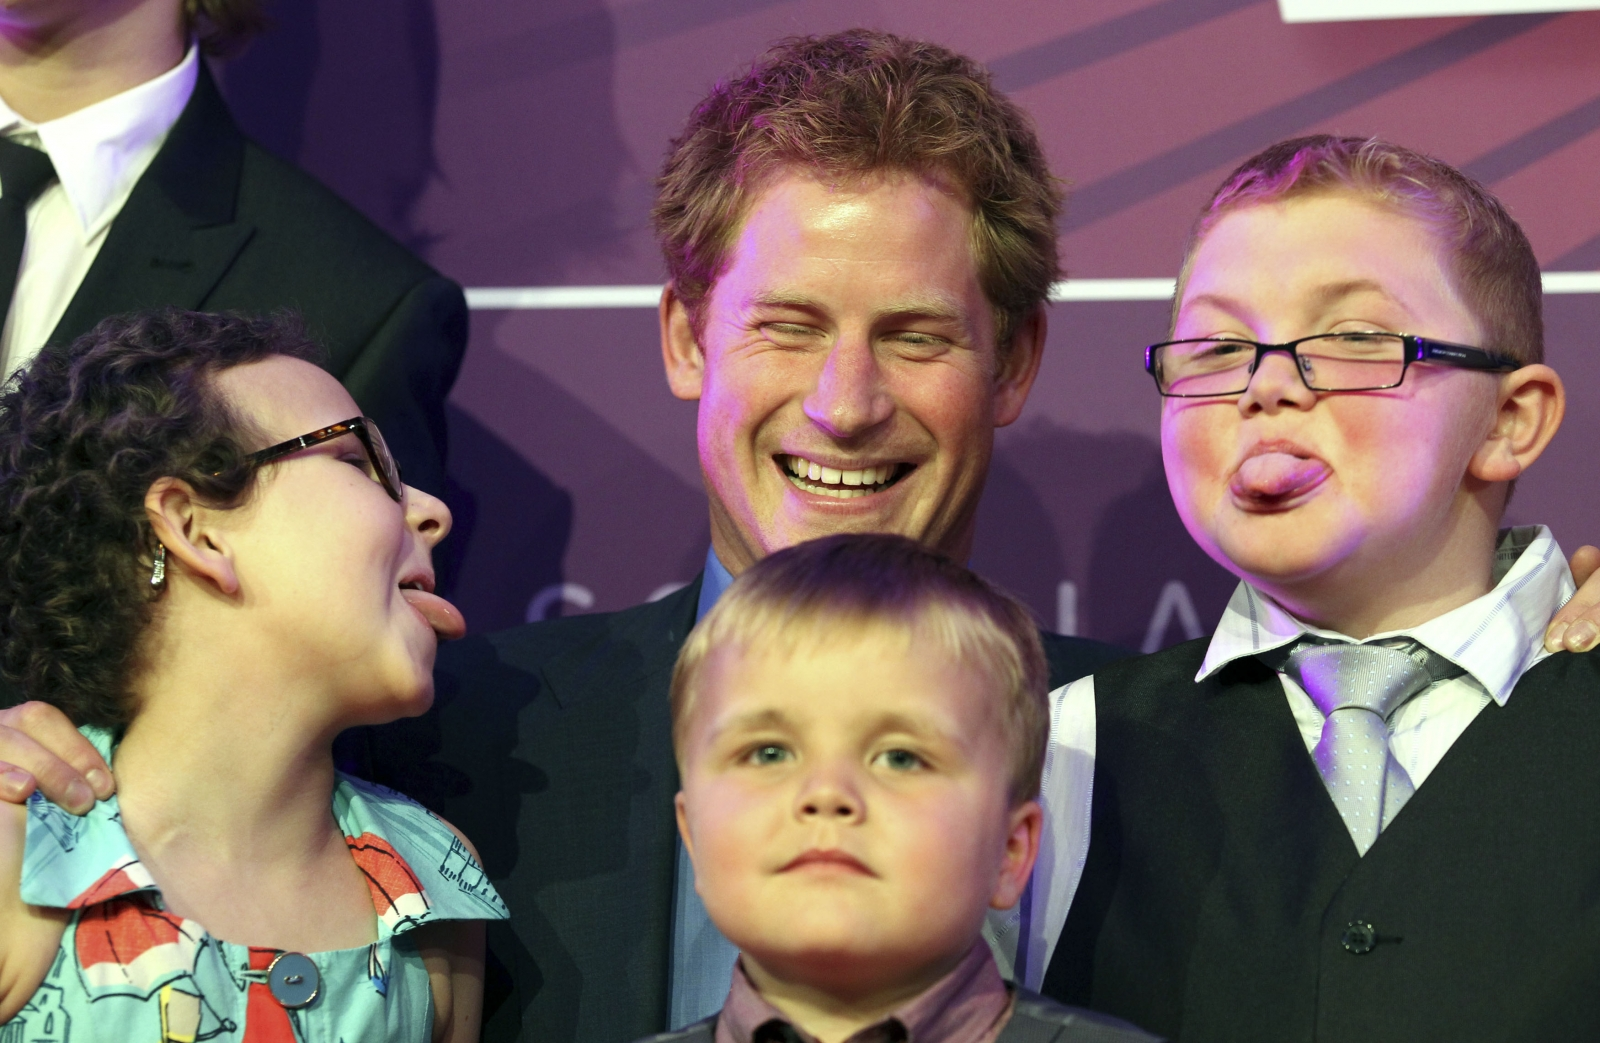 prince harry wellchild charity